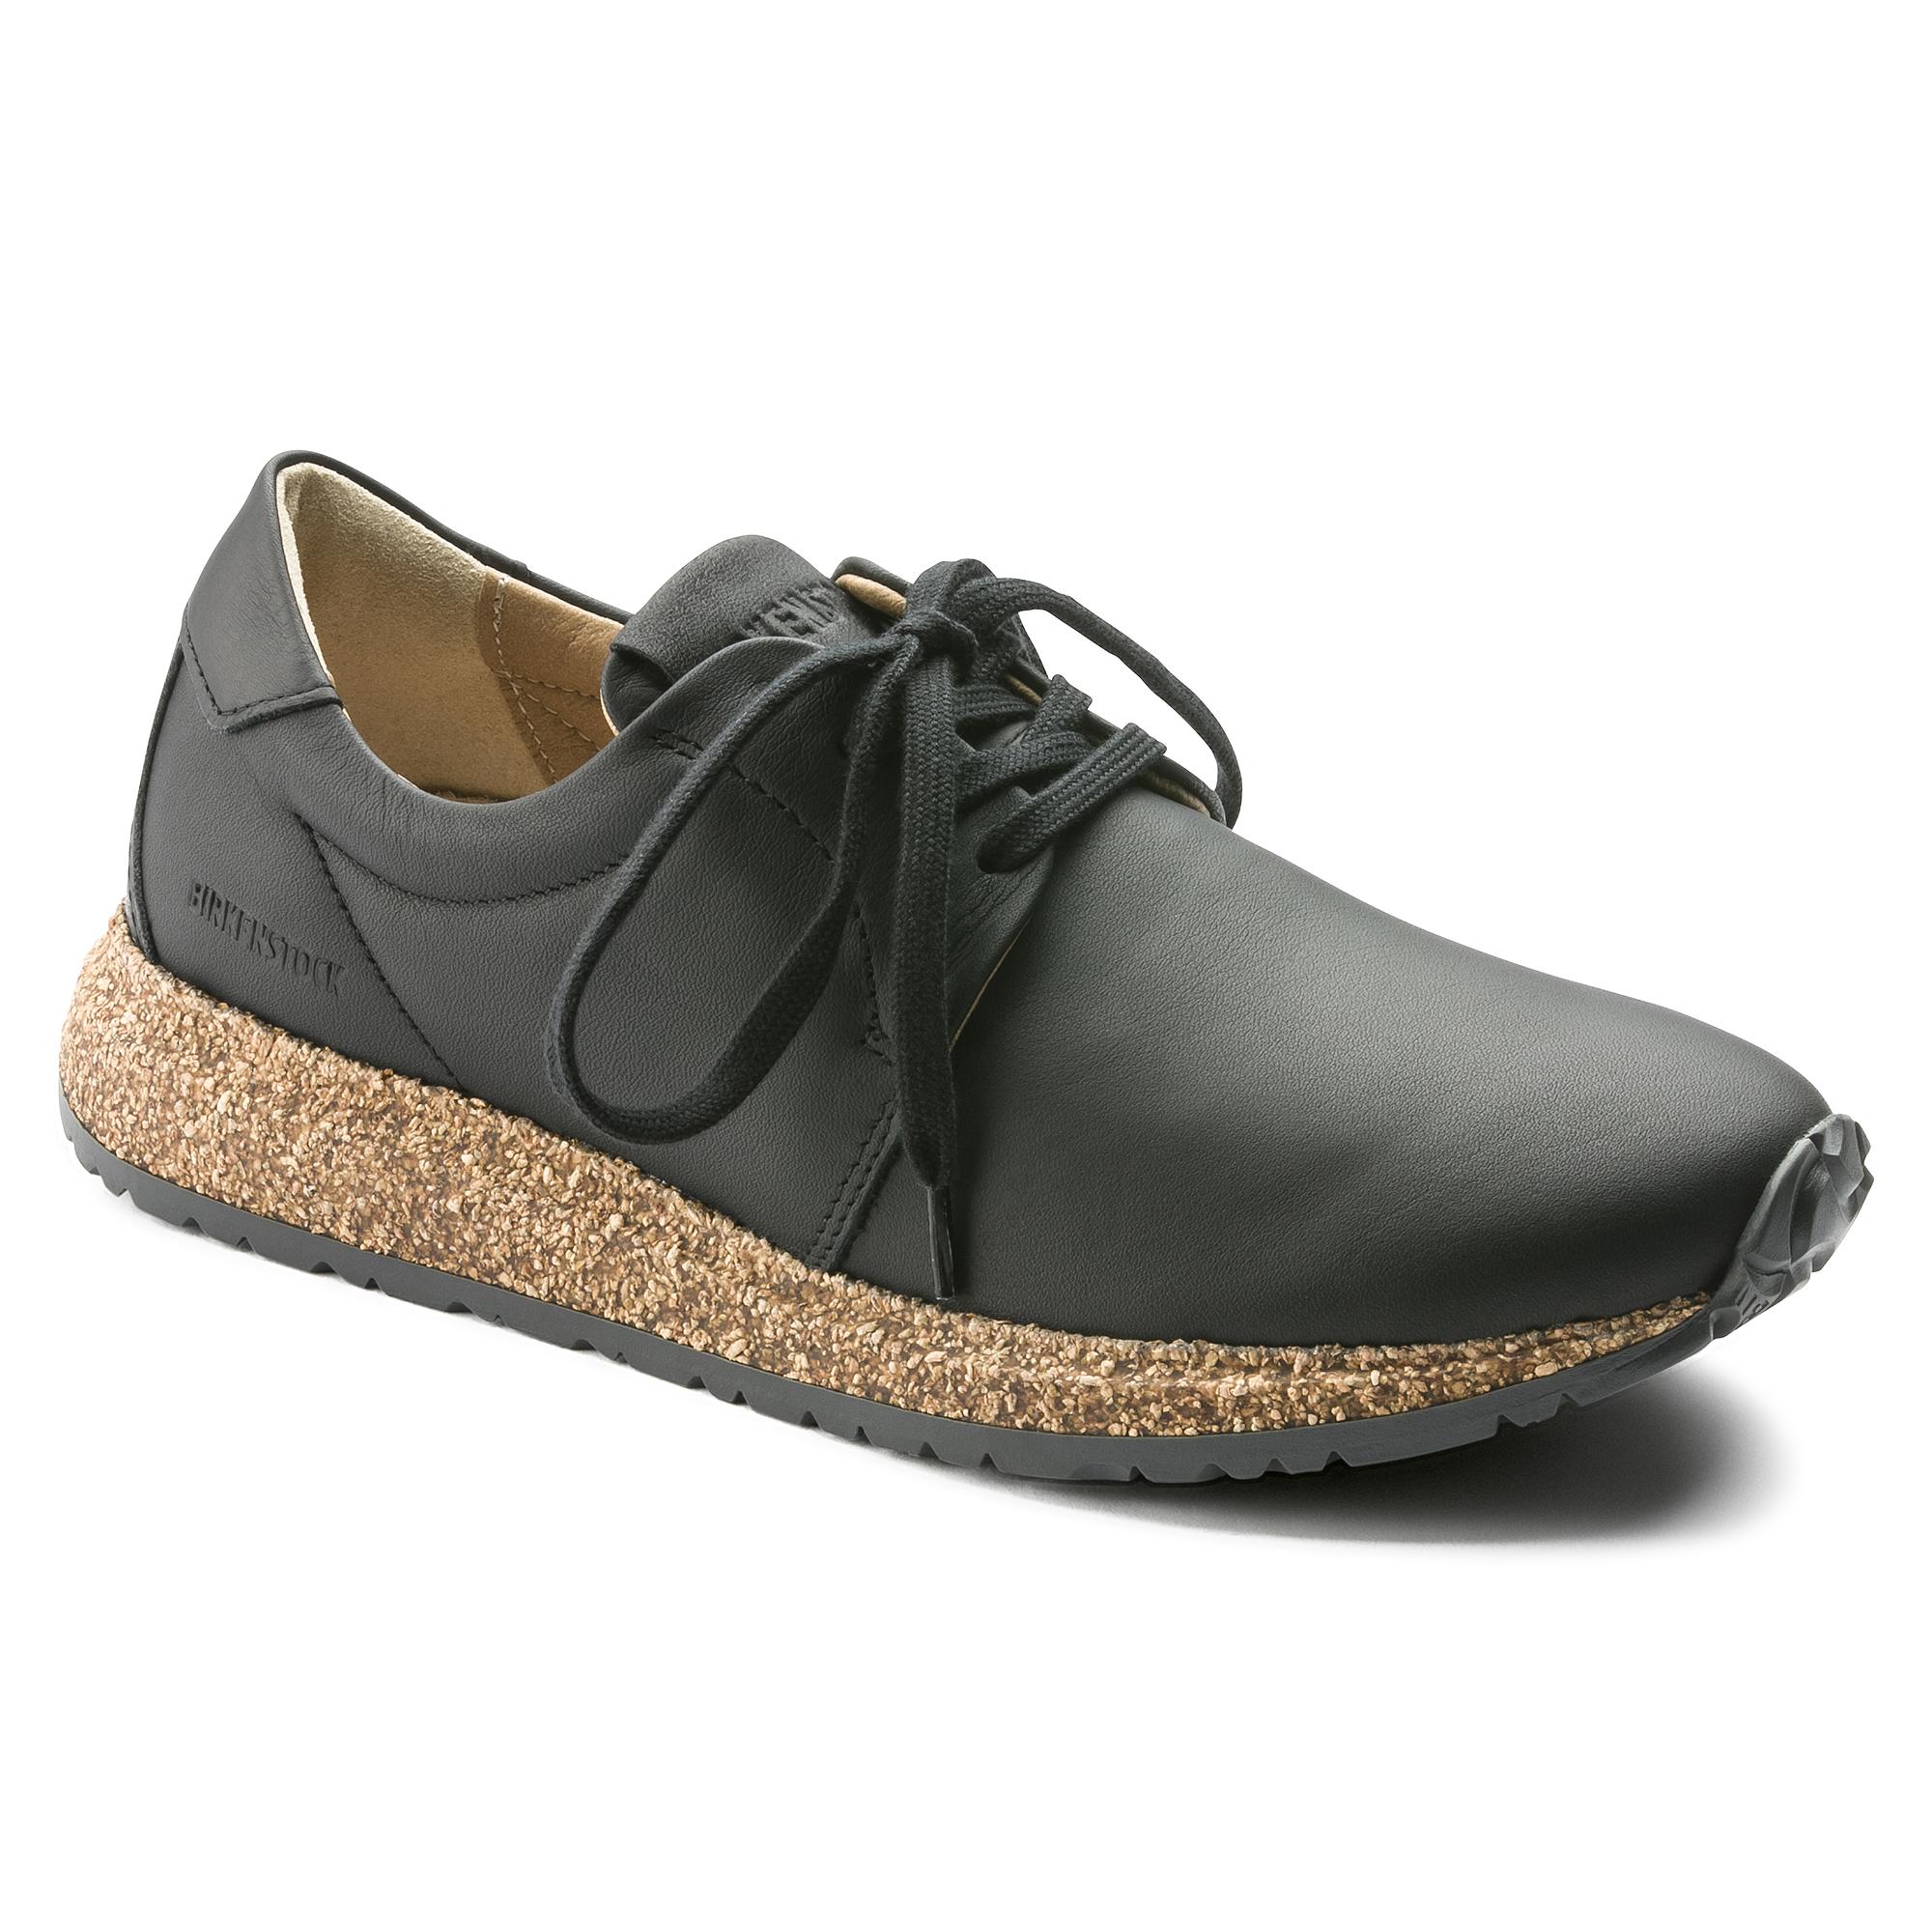 fa0731be9fa7a Wrigley Natural Leather Schwarz | online kaufen bei BIRKENSTOCK